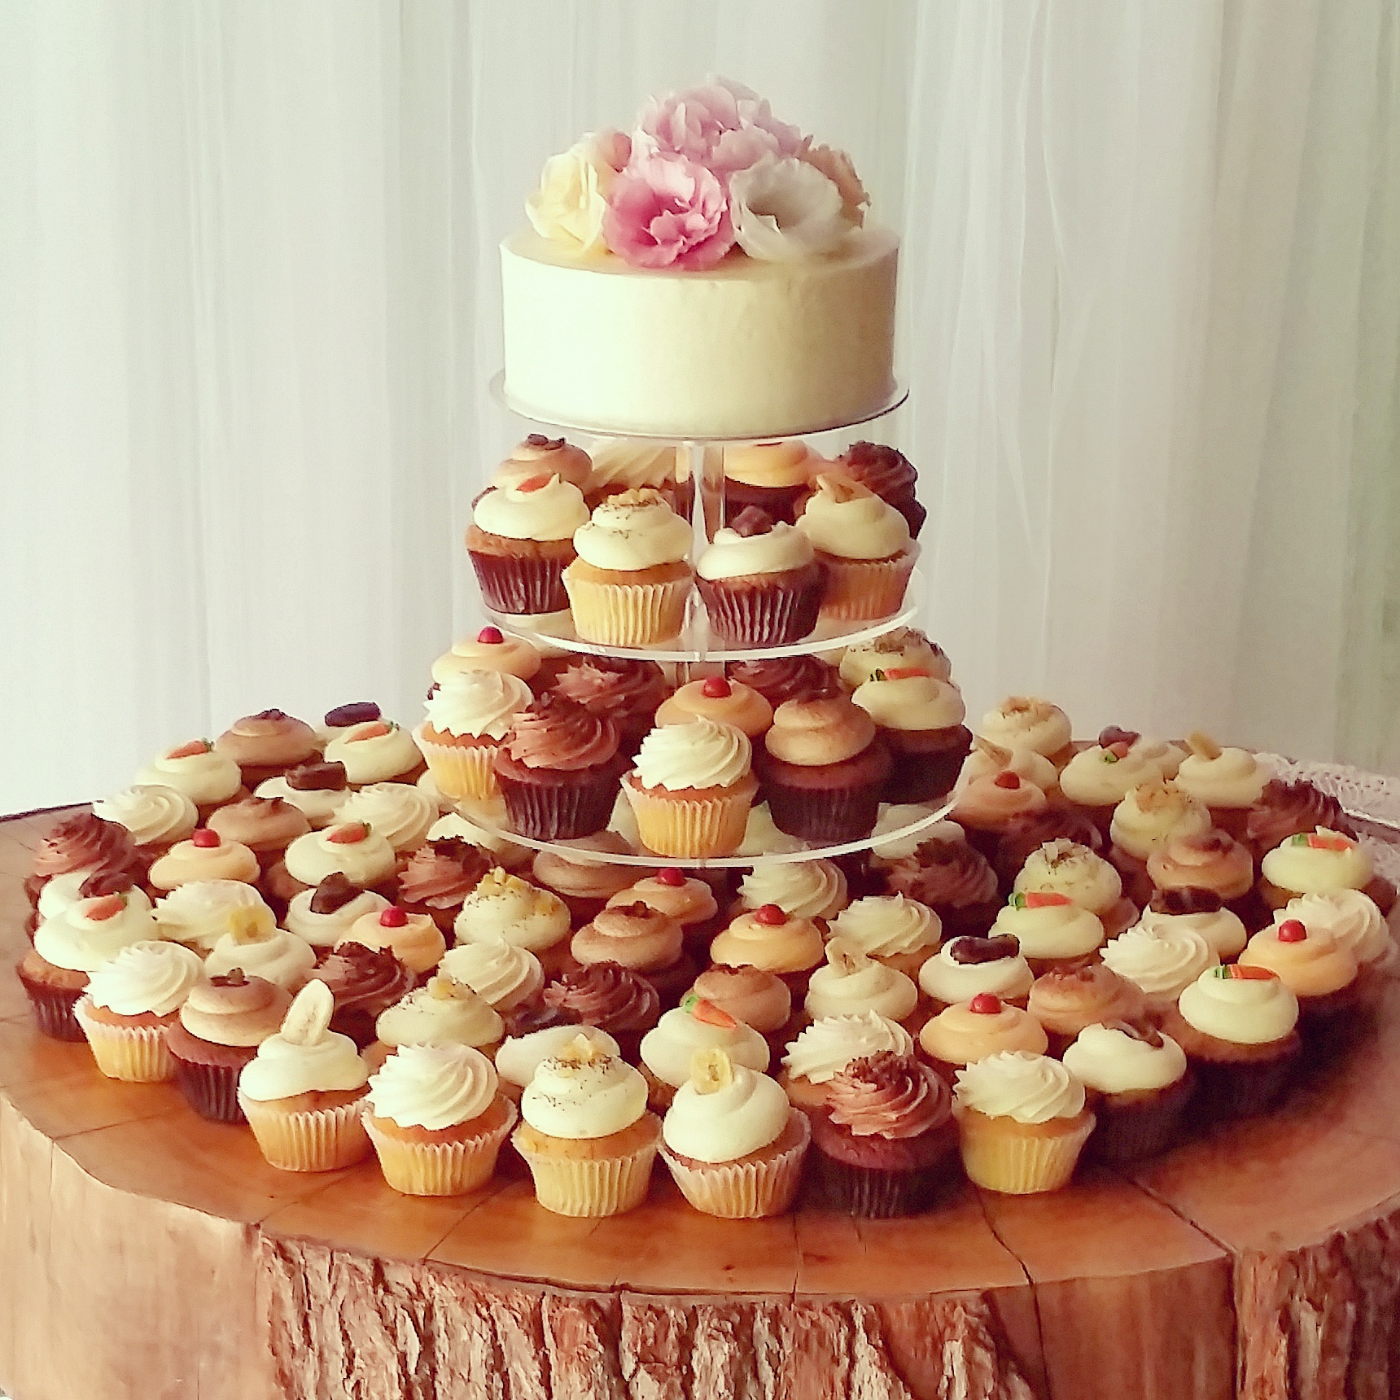 WEDDING & ENGAGEMENT — The Cupcake Patisserie